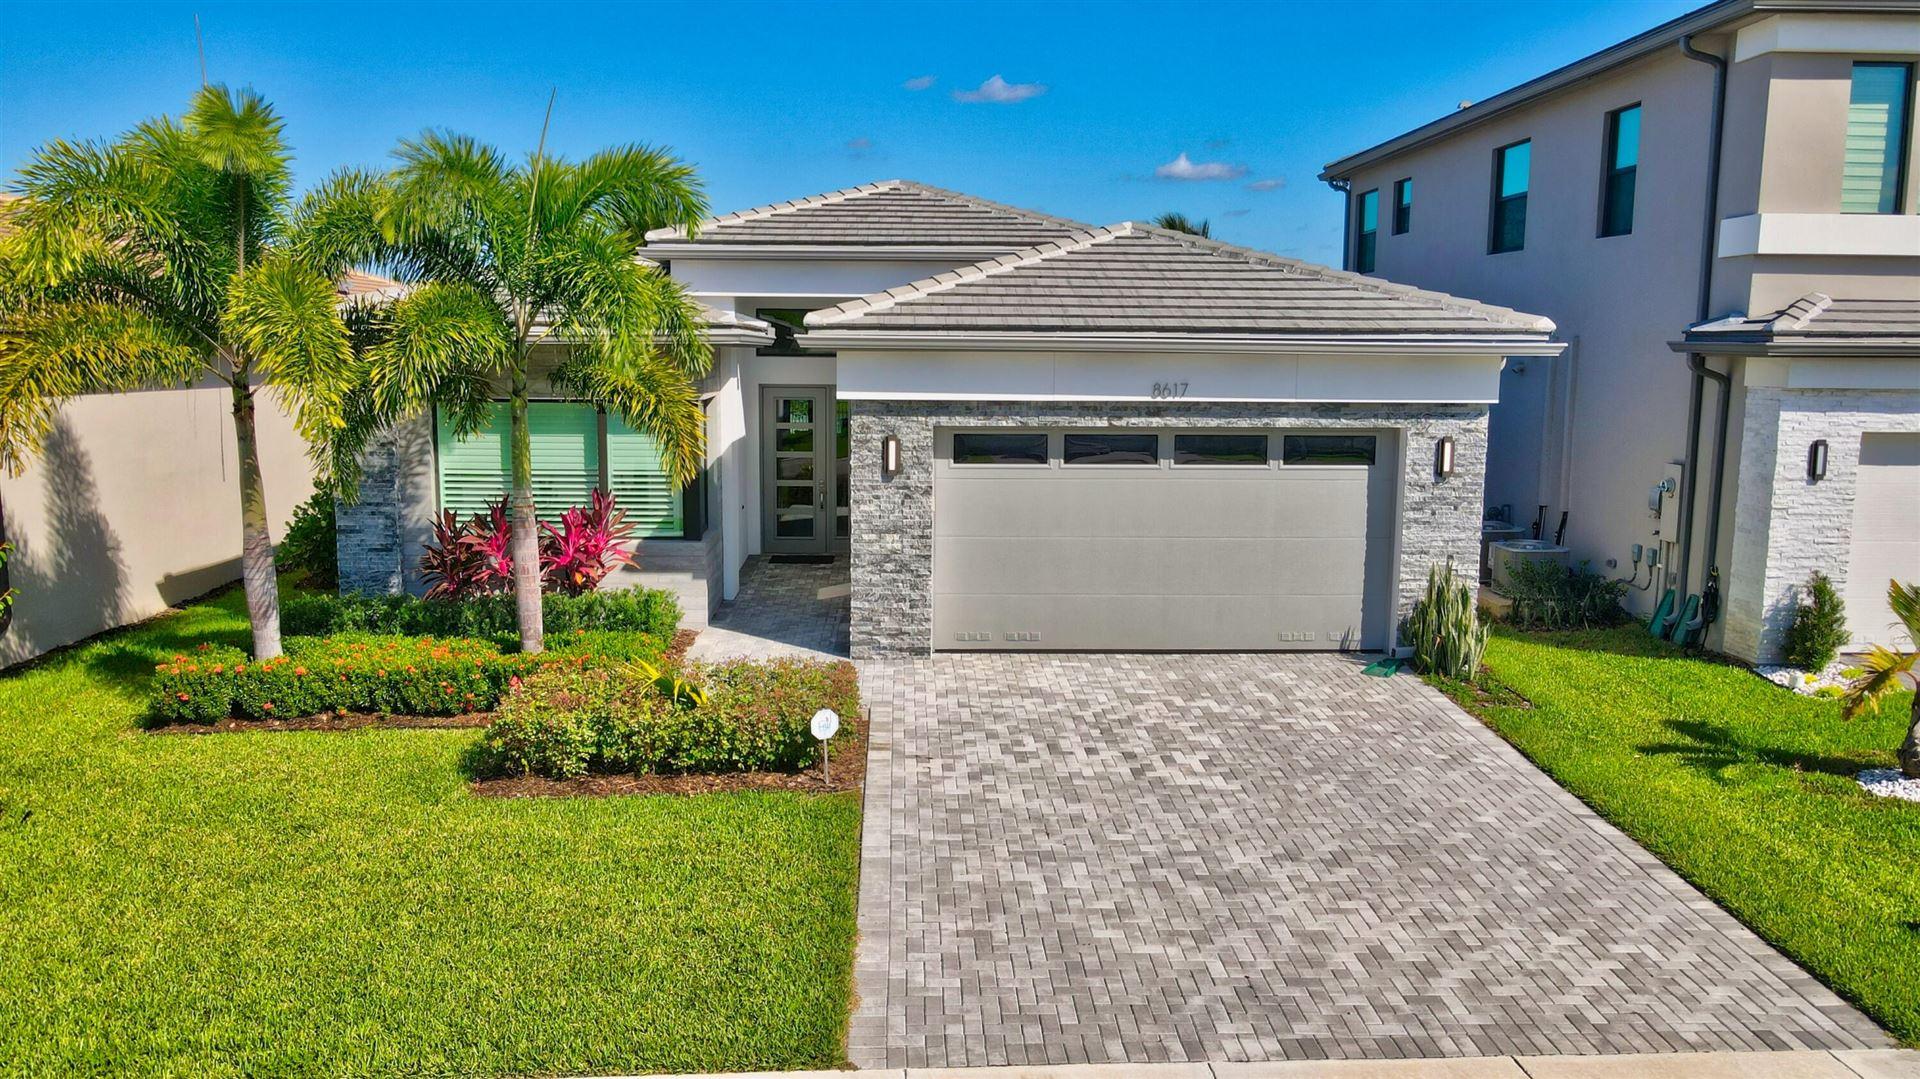 8617 Tower Bridge Court, Boca Raton, FL 33496 - #: RX-10753419